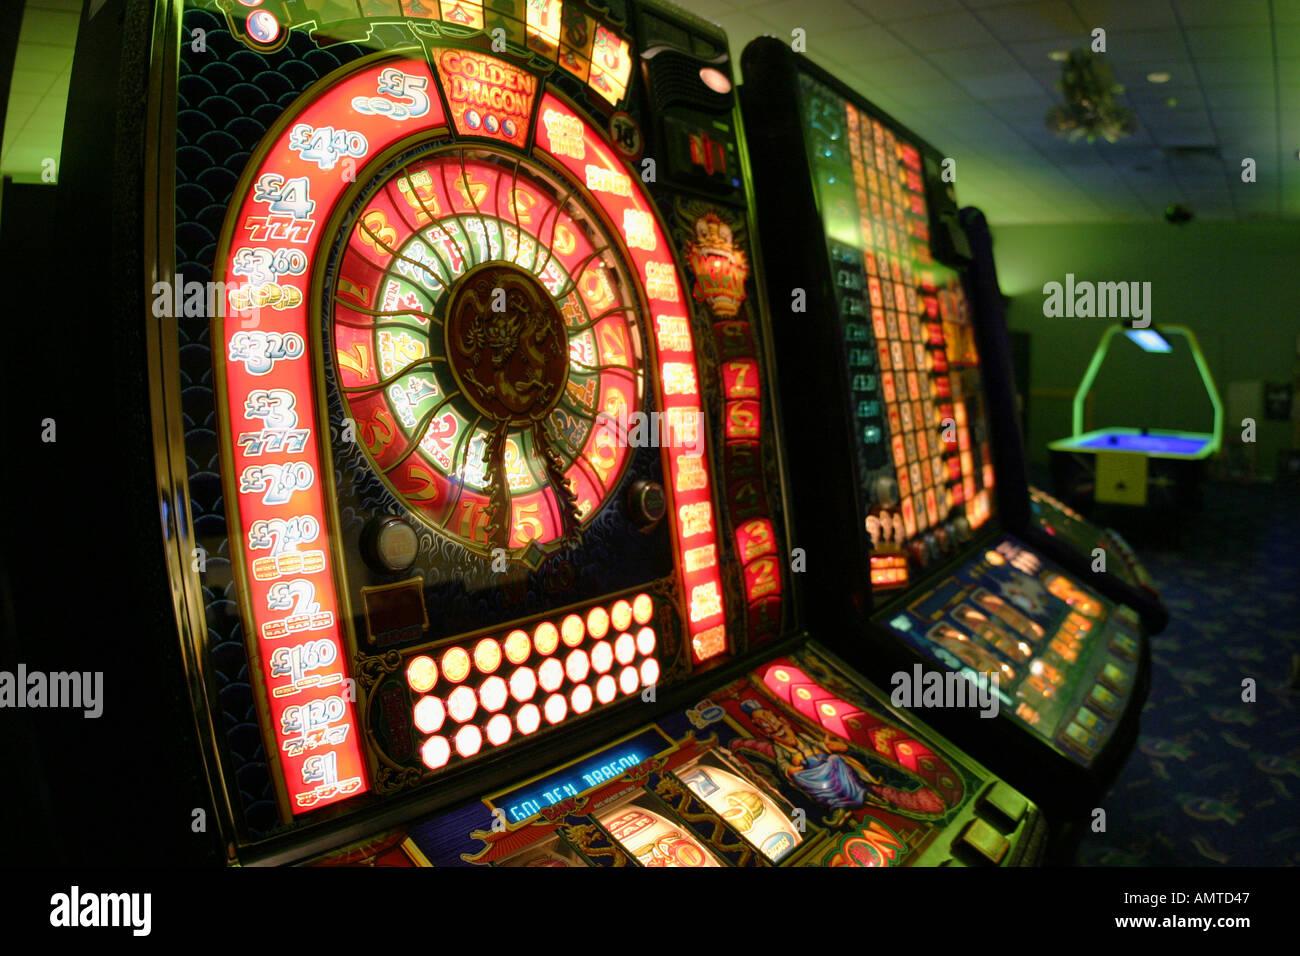 arcade games gambling - Stock Image